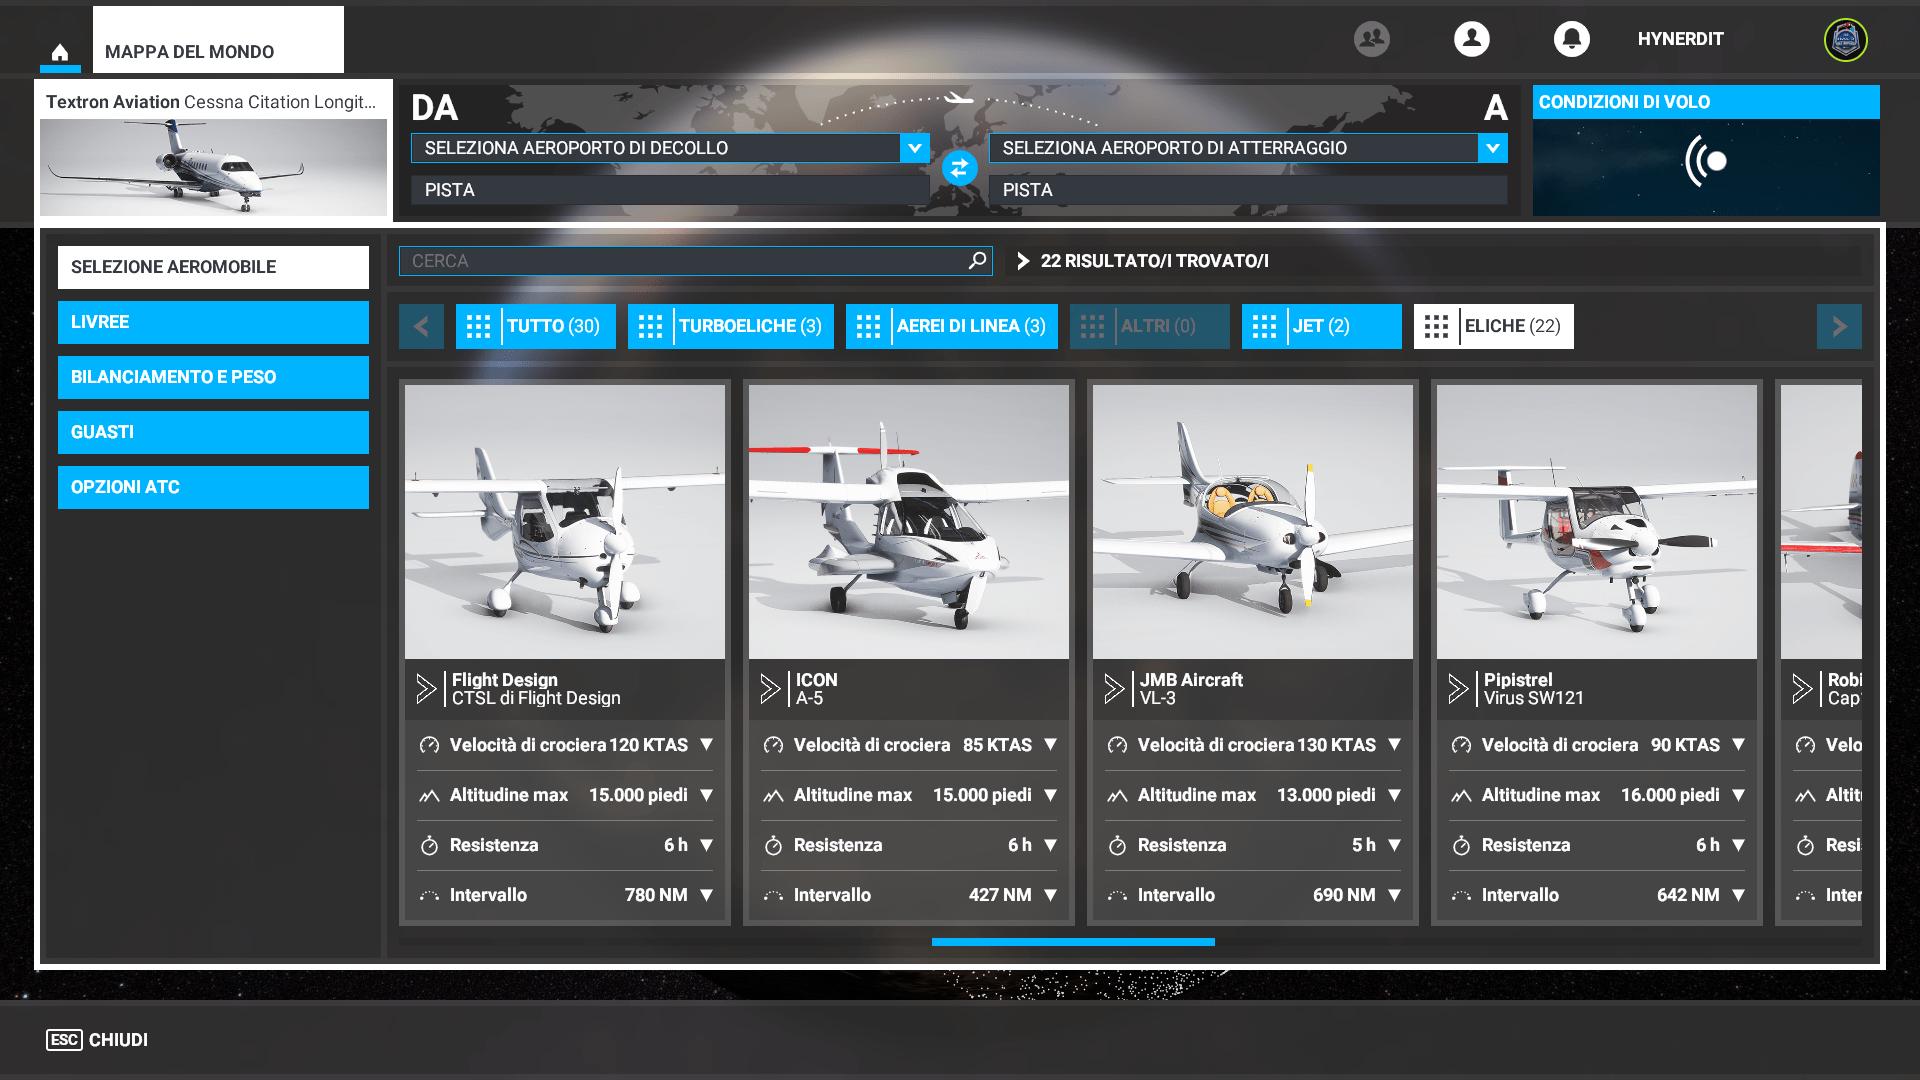 Microsoft Flight Simulator 2020: La Recensione 11 - Hynerd.it